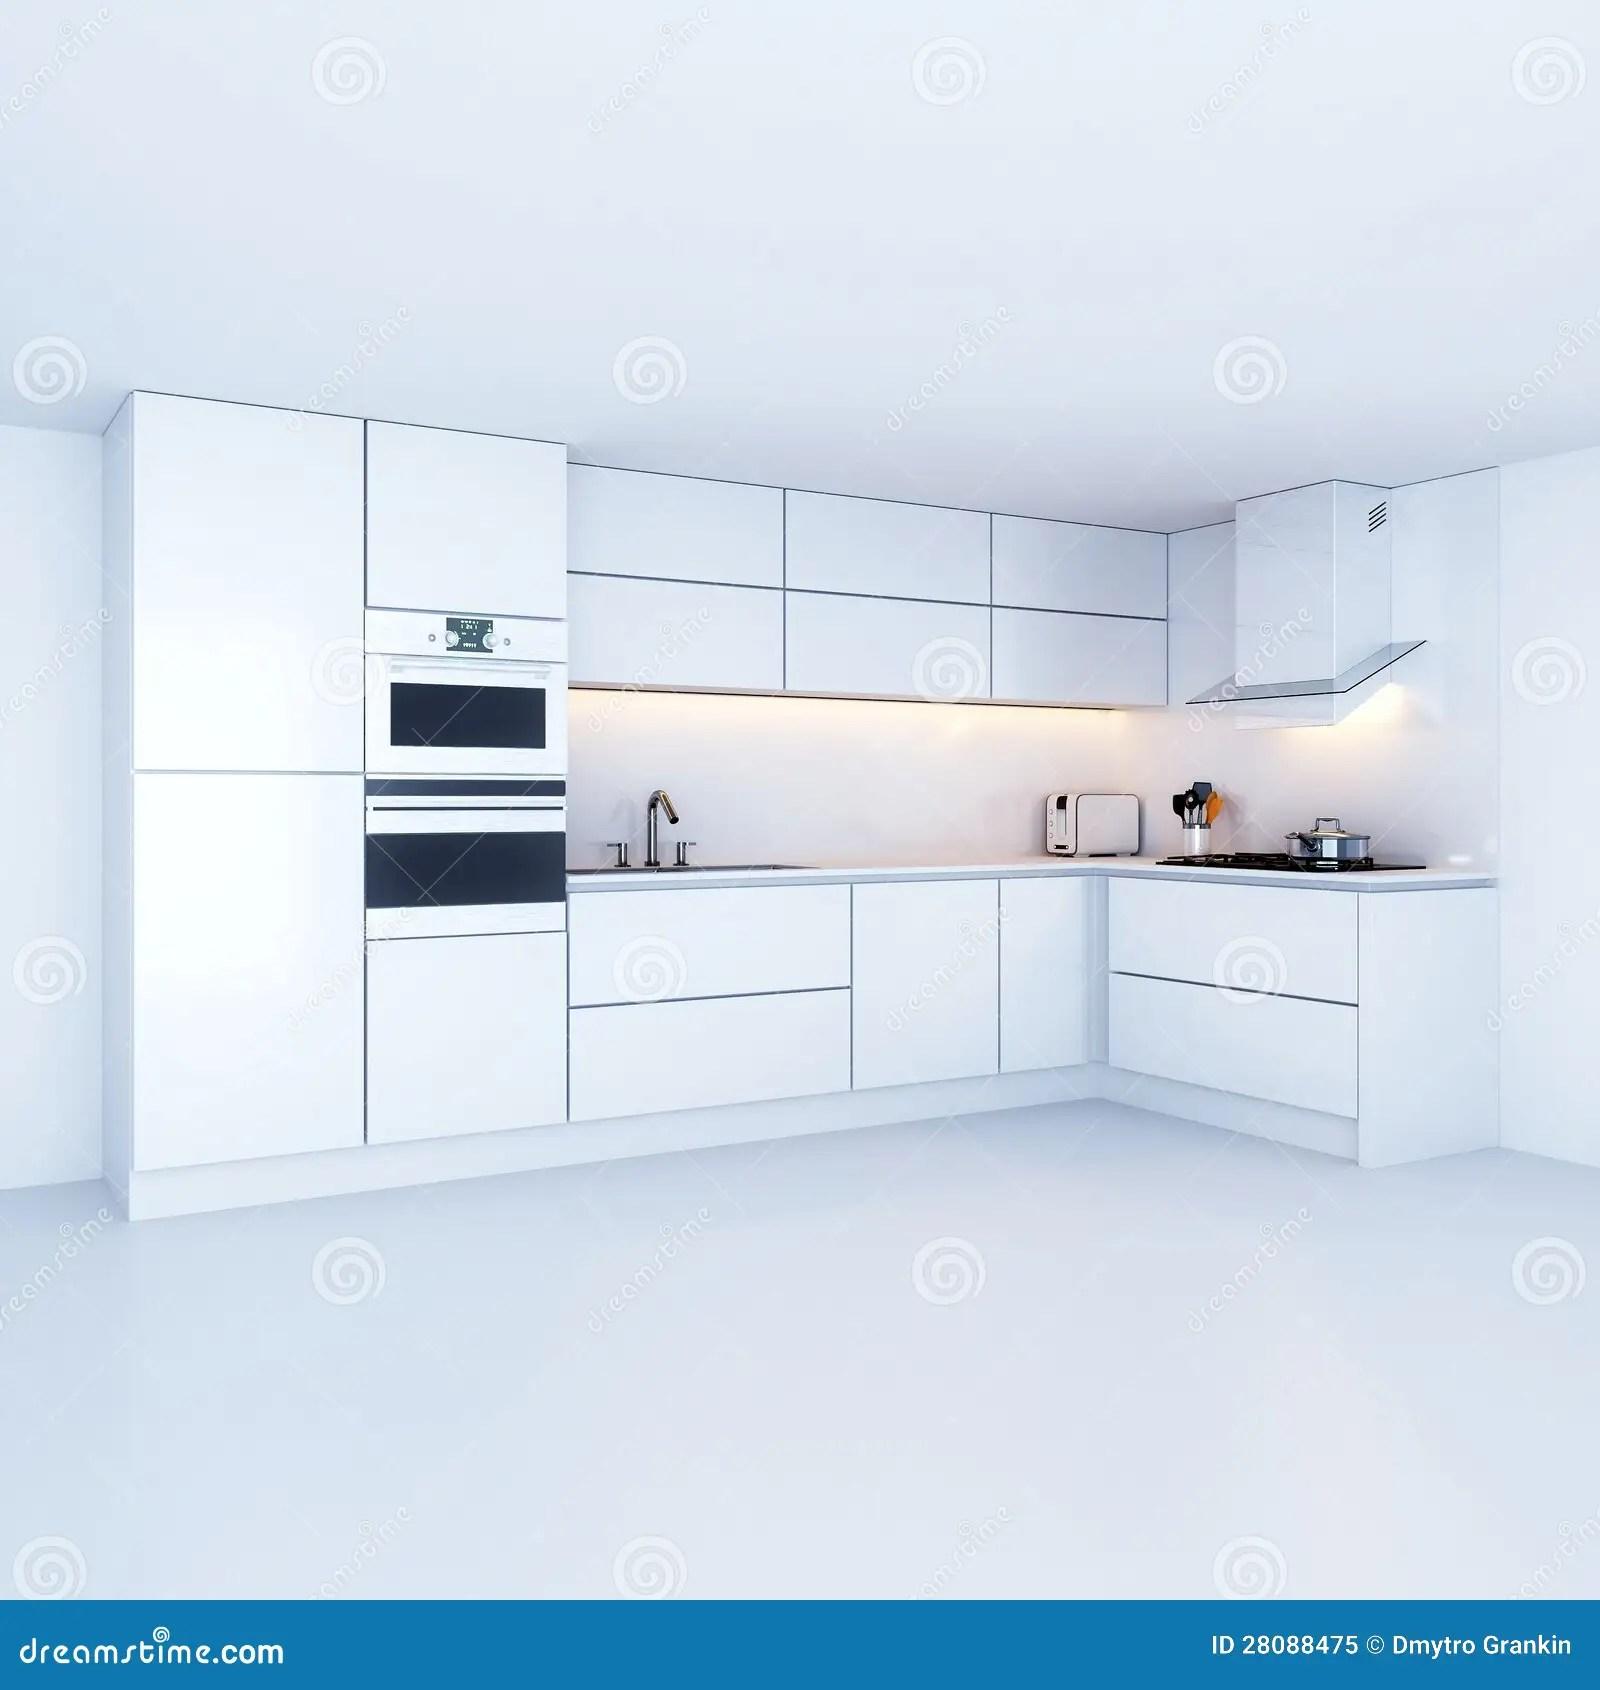 10x10 kitchen cabinets confidential book 在新的空白内部的现代厨柜库存例证 插画包括有装饰 设计 楼层 现代 在新的空白内部的现代厨柜